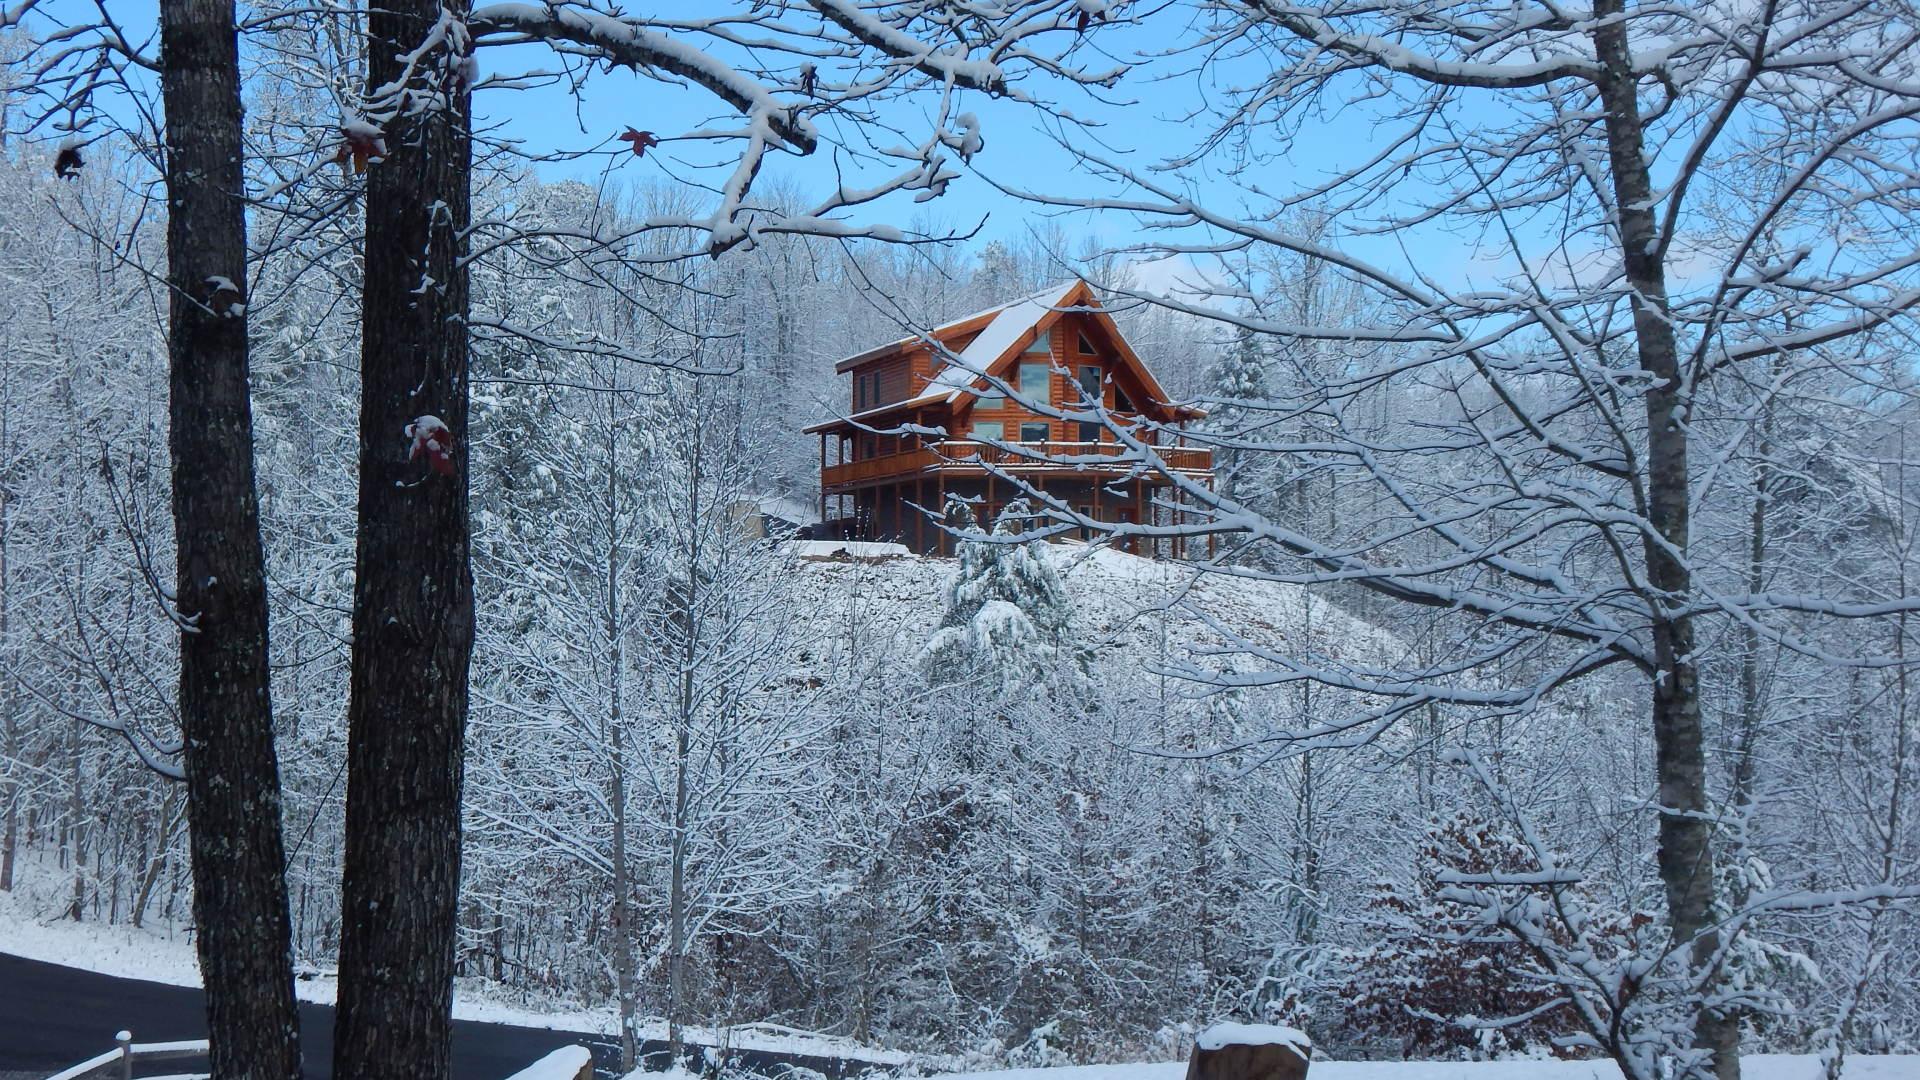 Ridge view Lodge by owner cabin Gatlinburg Pigeon Forge